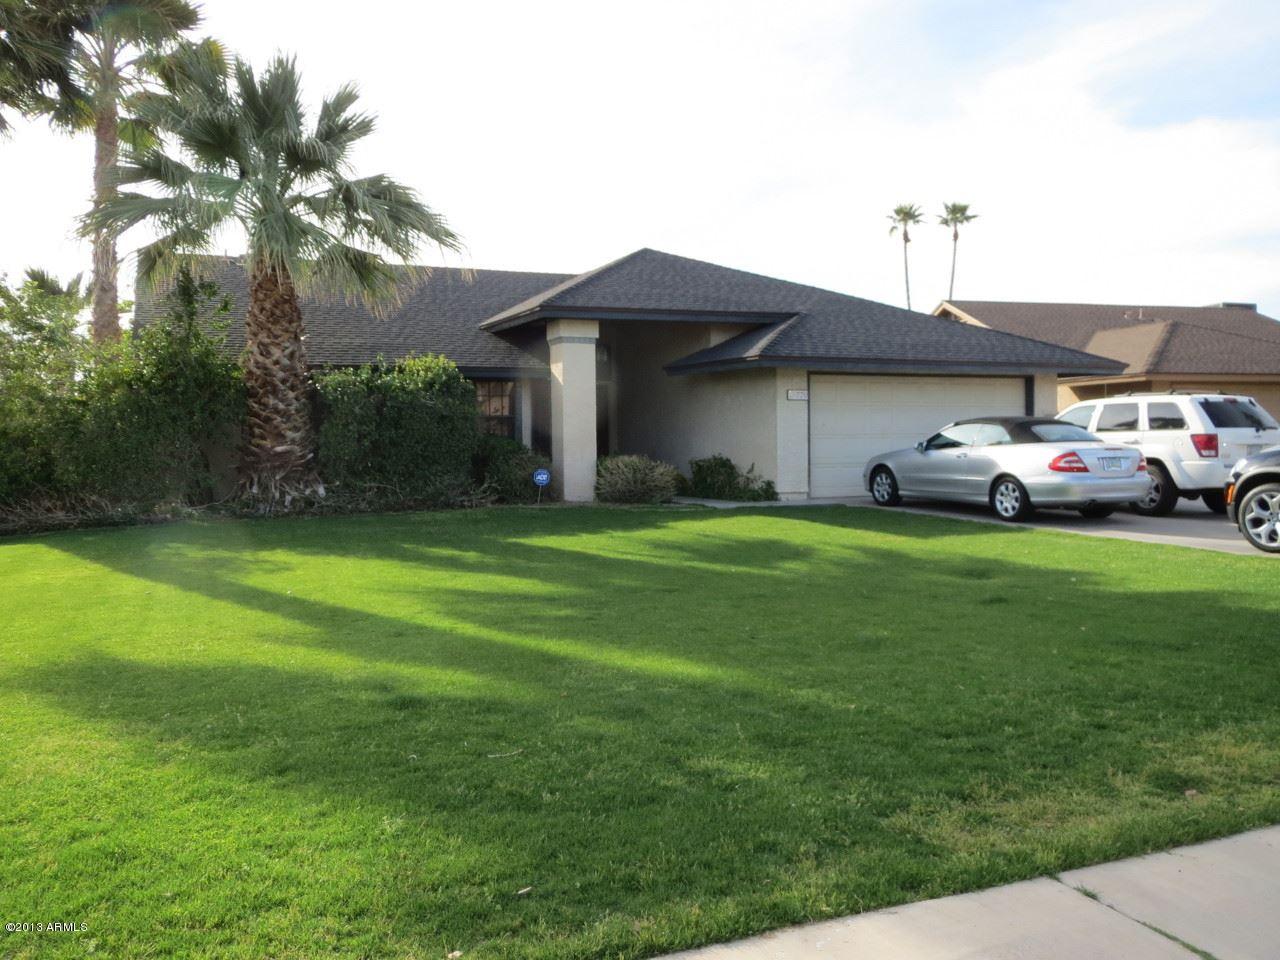 Photo of 10770 N 108TH Way, Scottsdale, AZ 85259 (MLS # 6269110)